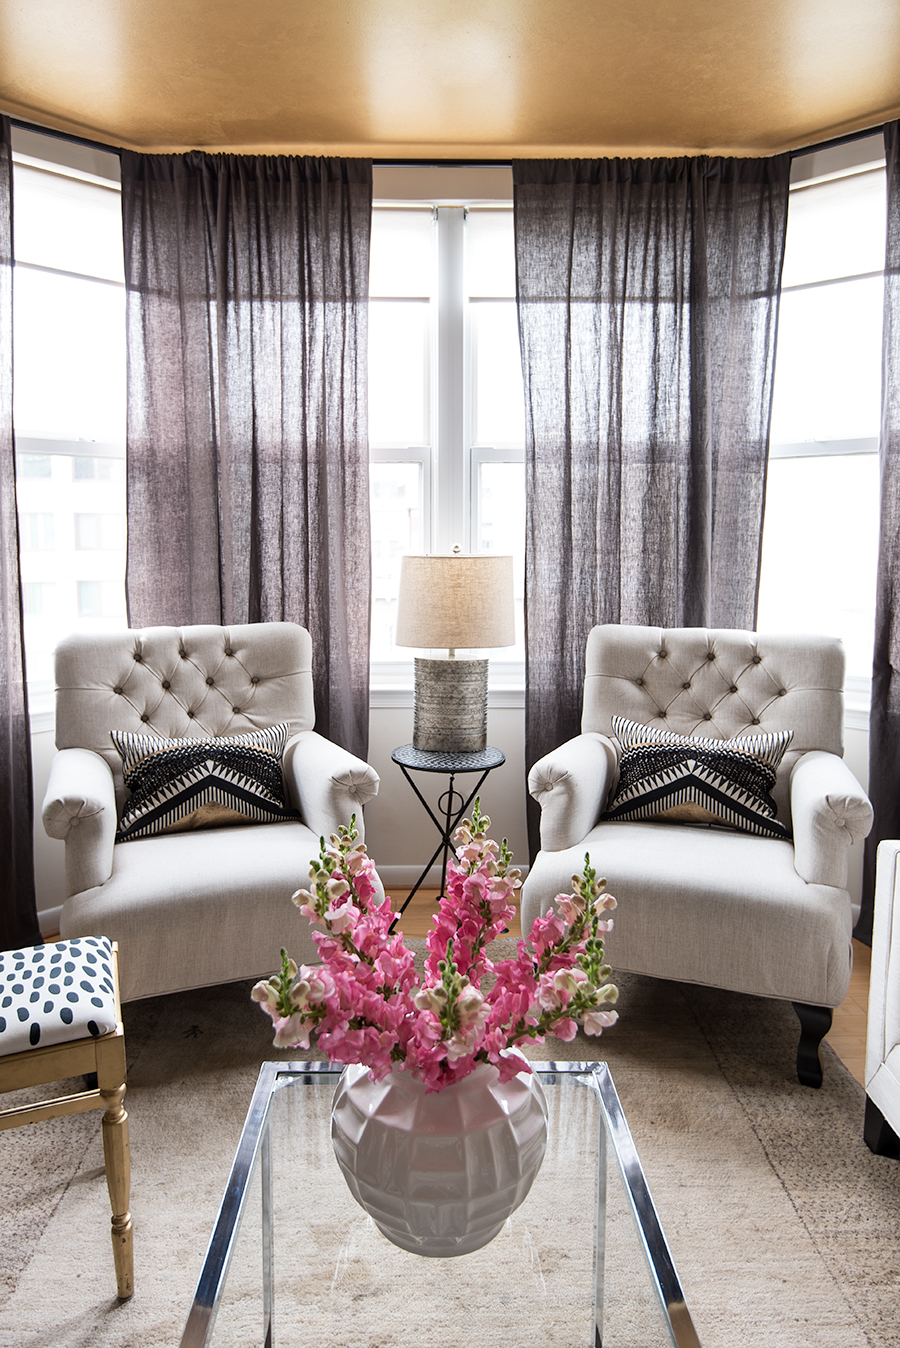 bay-windows-seating-area-dc-apartment-washington-dc-splendor-styling-mariella-cruzado.jpg